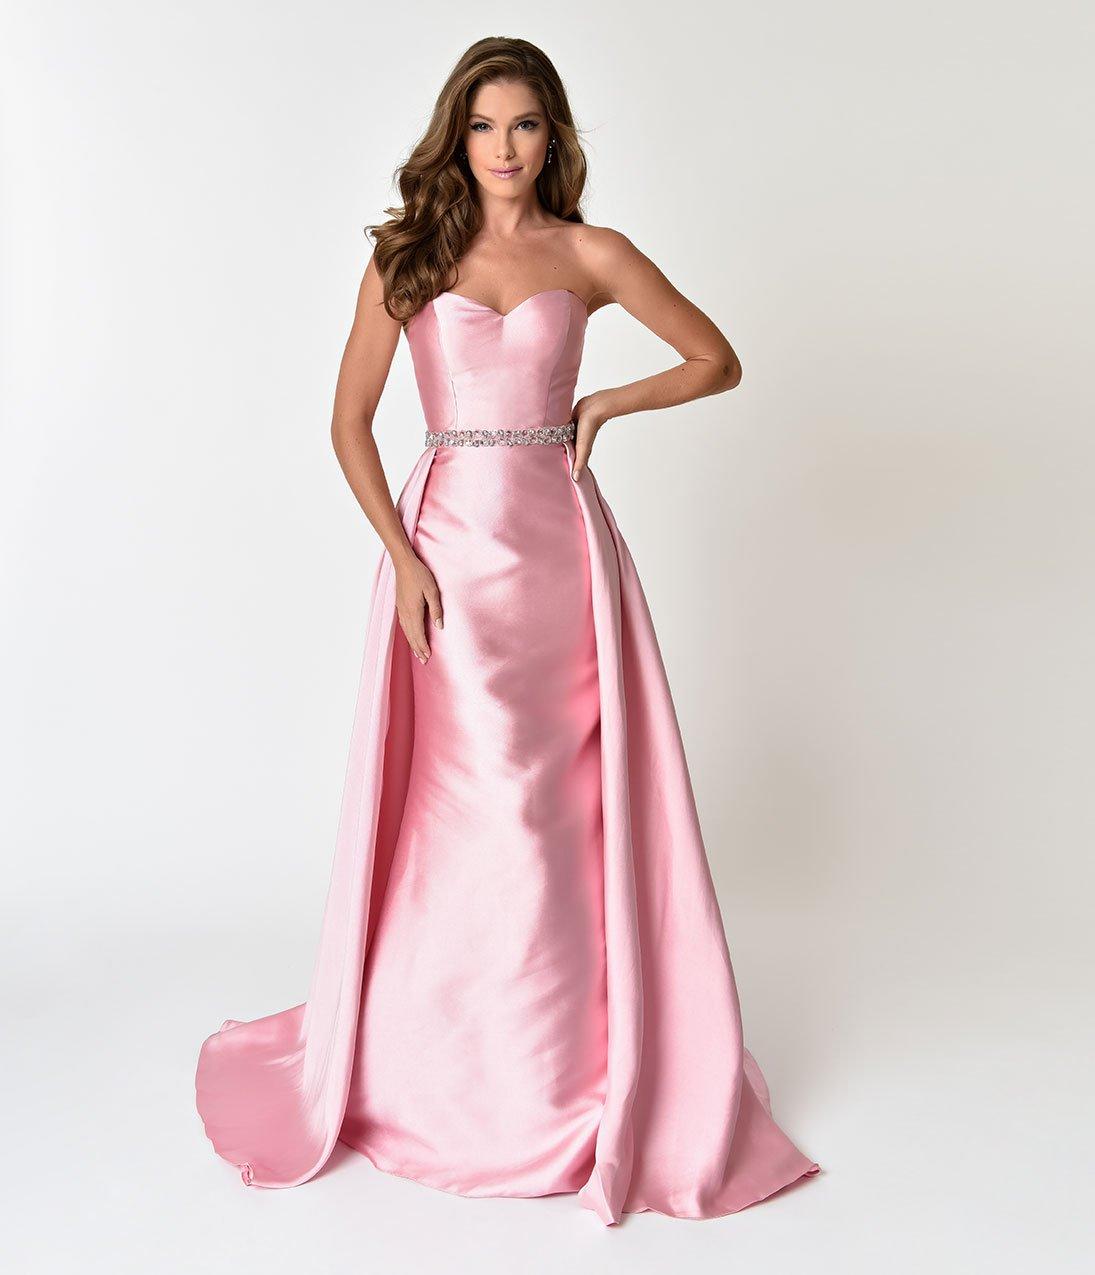 1950s Vintage Evening Dress Pink Strapless Sweetheart Neckline Satin Prom Gown Evening Dresses Vintage Prom Gown Vintage Dresses [ 1275 x 1095 Pixel ]